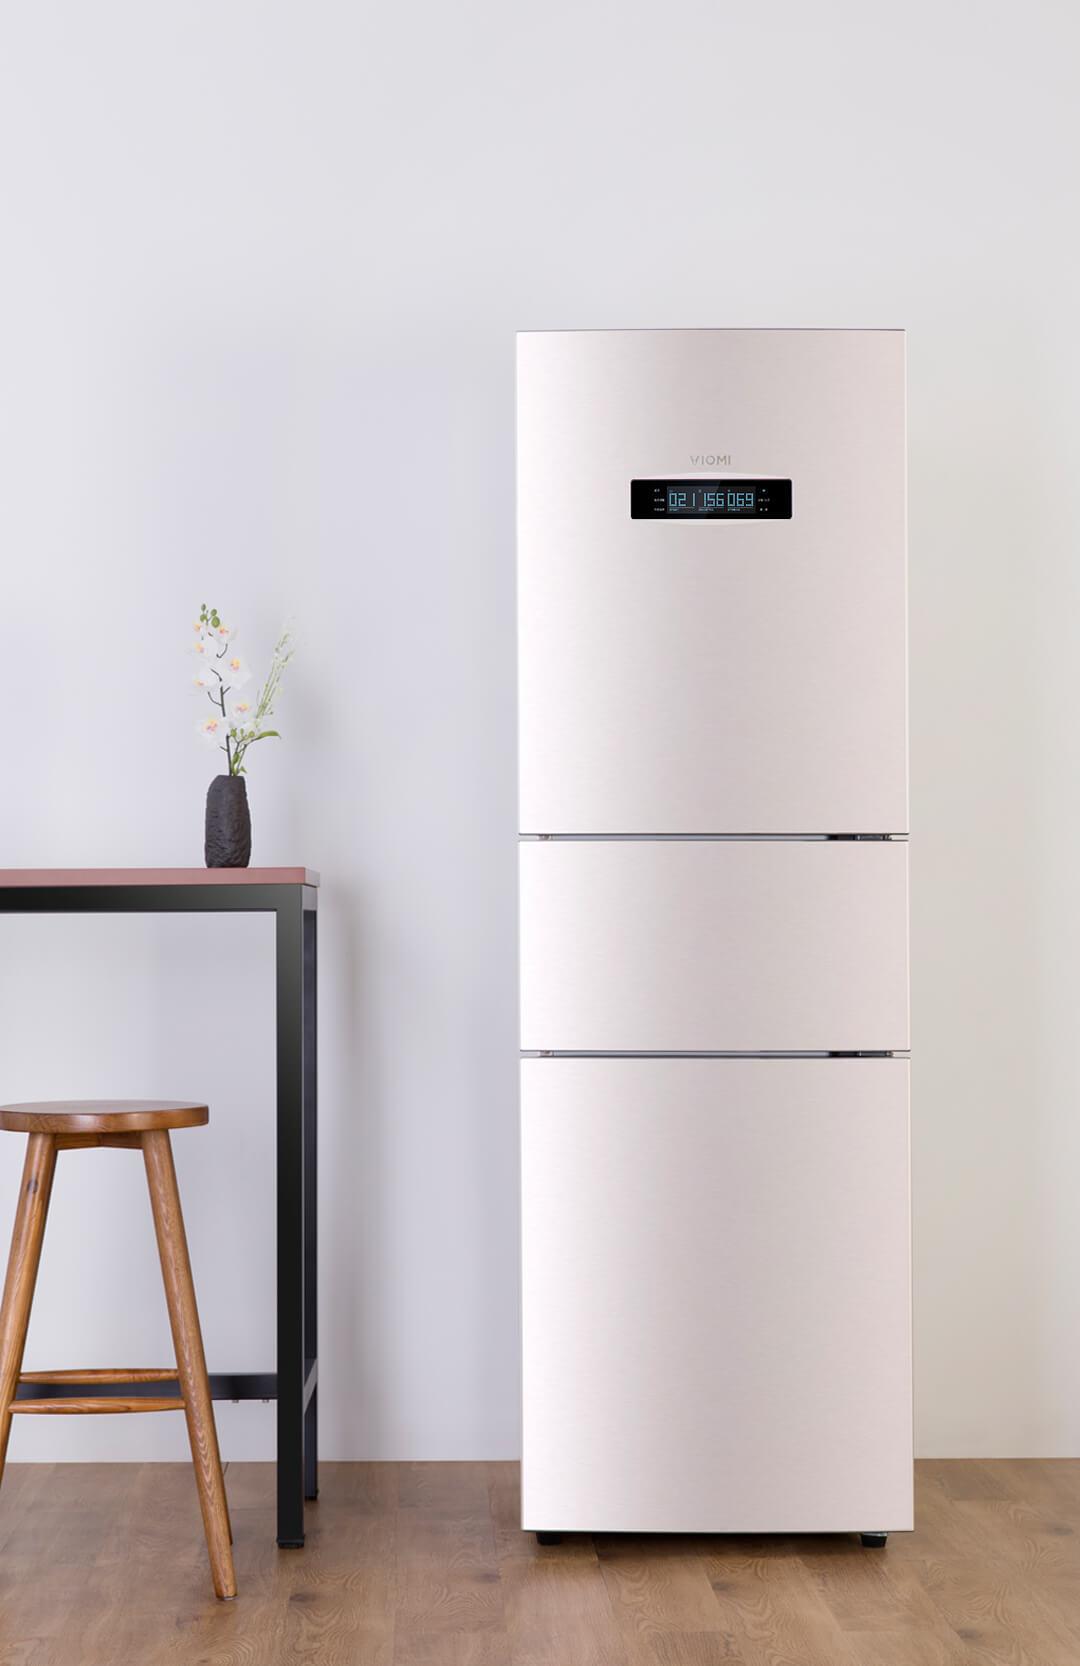 Smart Refrigerator Xiaomi